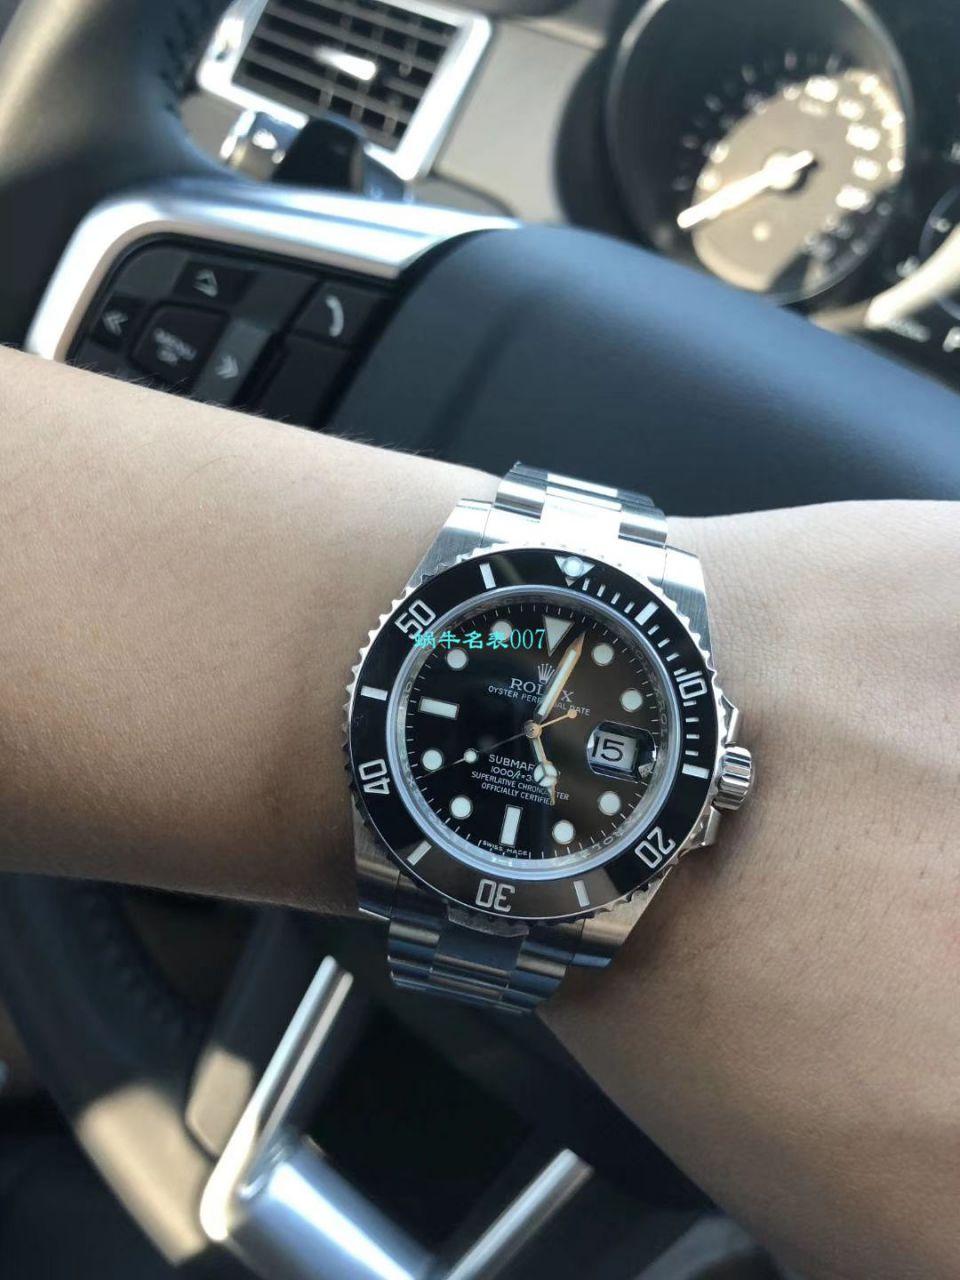 【NOOB厂V9版本904L不锈钢版本】劳力士潜航者型系列116610LV-97200 绿盘腕表(绿水鬼)、116610LN-97200 《黑水鬼》